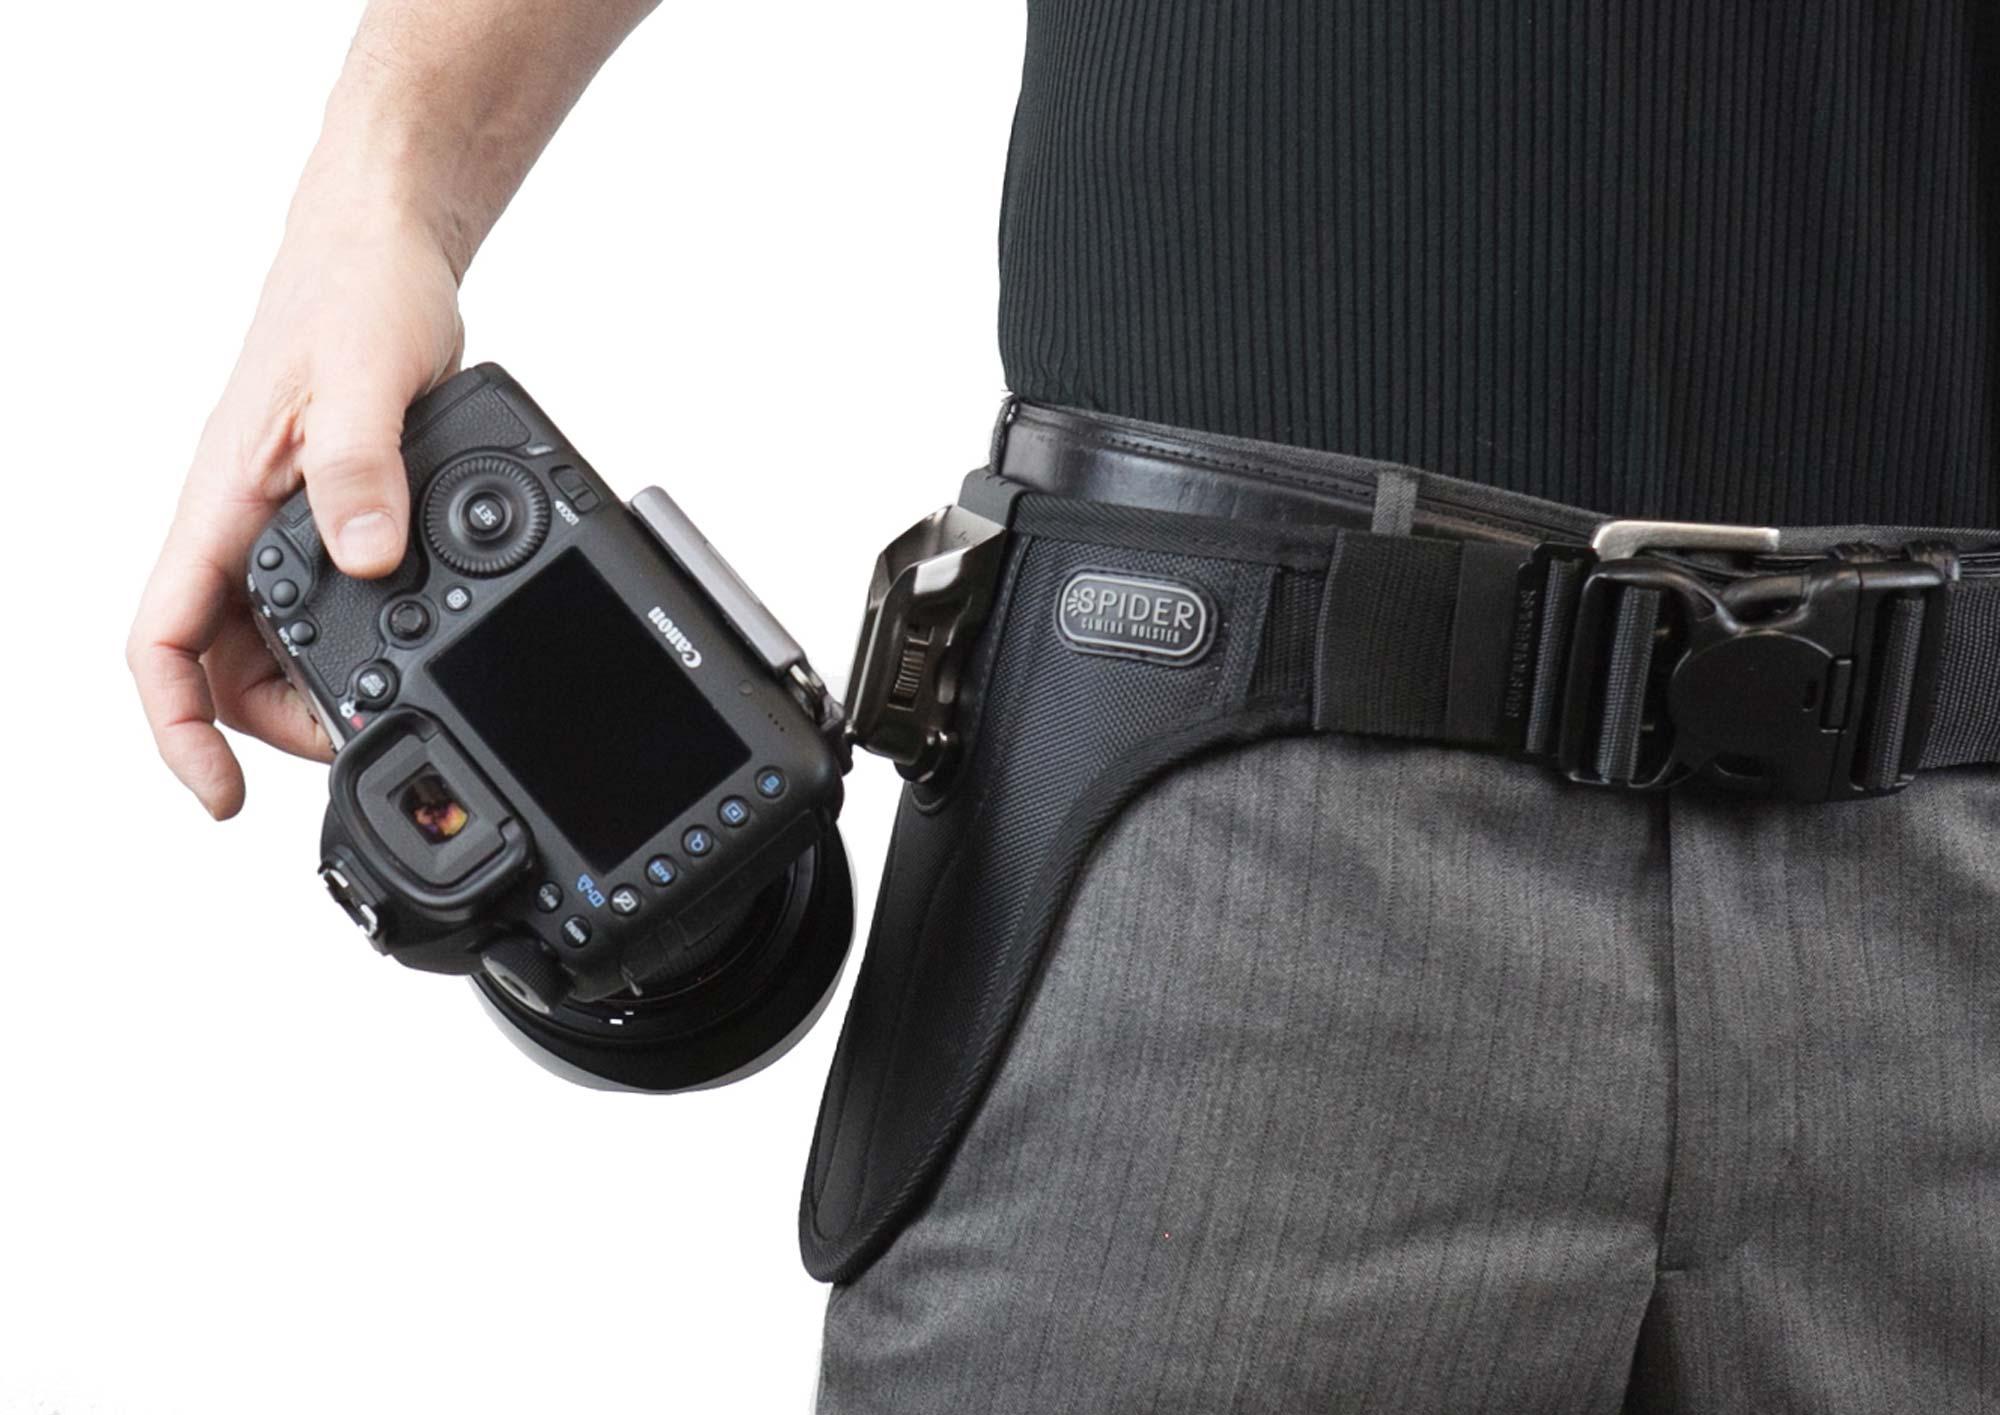 SPIDER PRO v2 Single Camera System – Hüft-Tragesystem mit Hüftgurt und Holster für 1 prof. DSLR